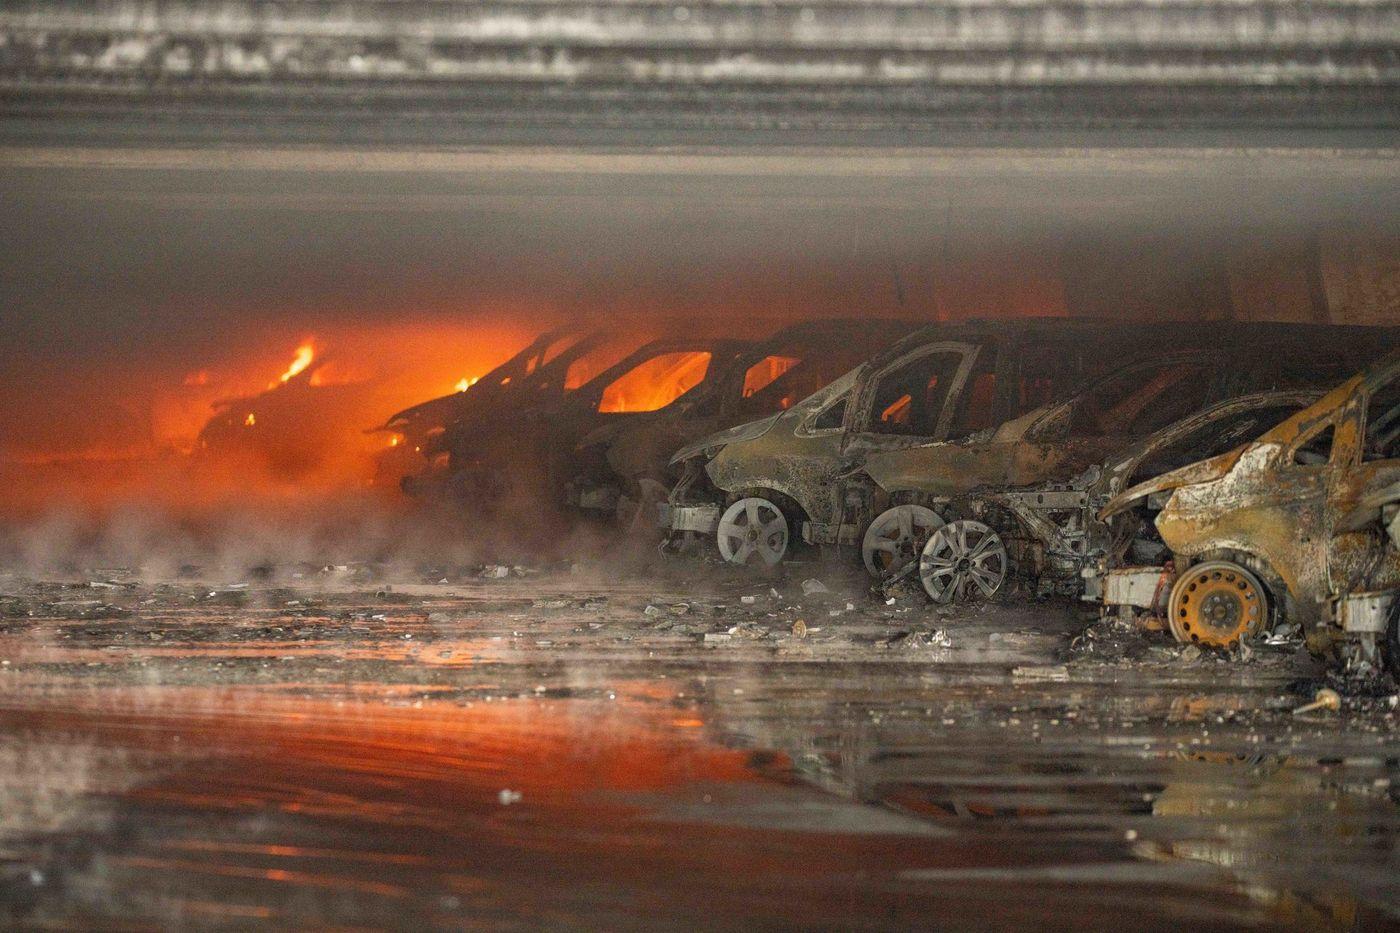 Burnt Benz Brooklyn Kings Plaza